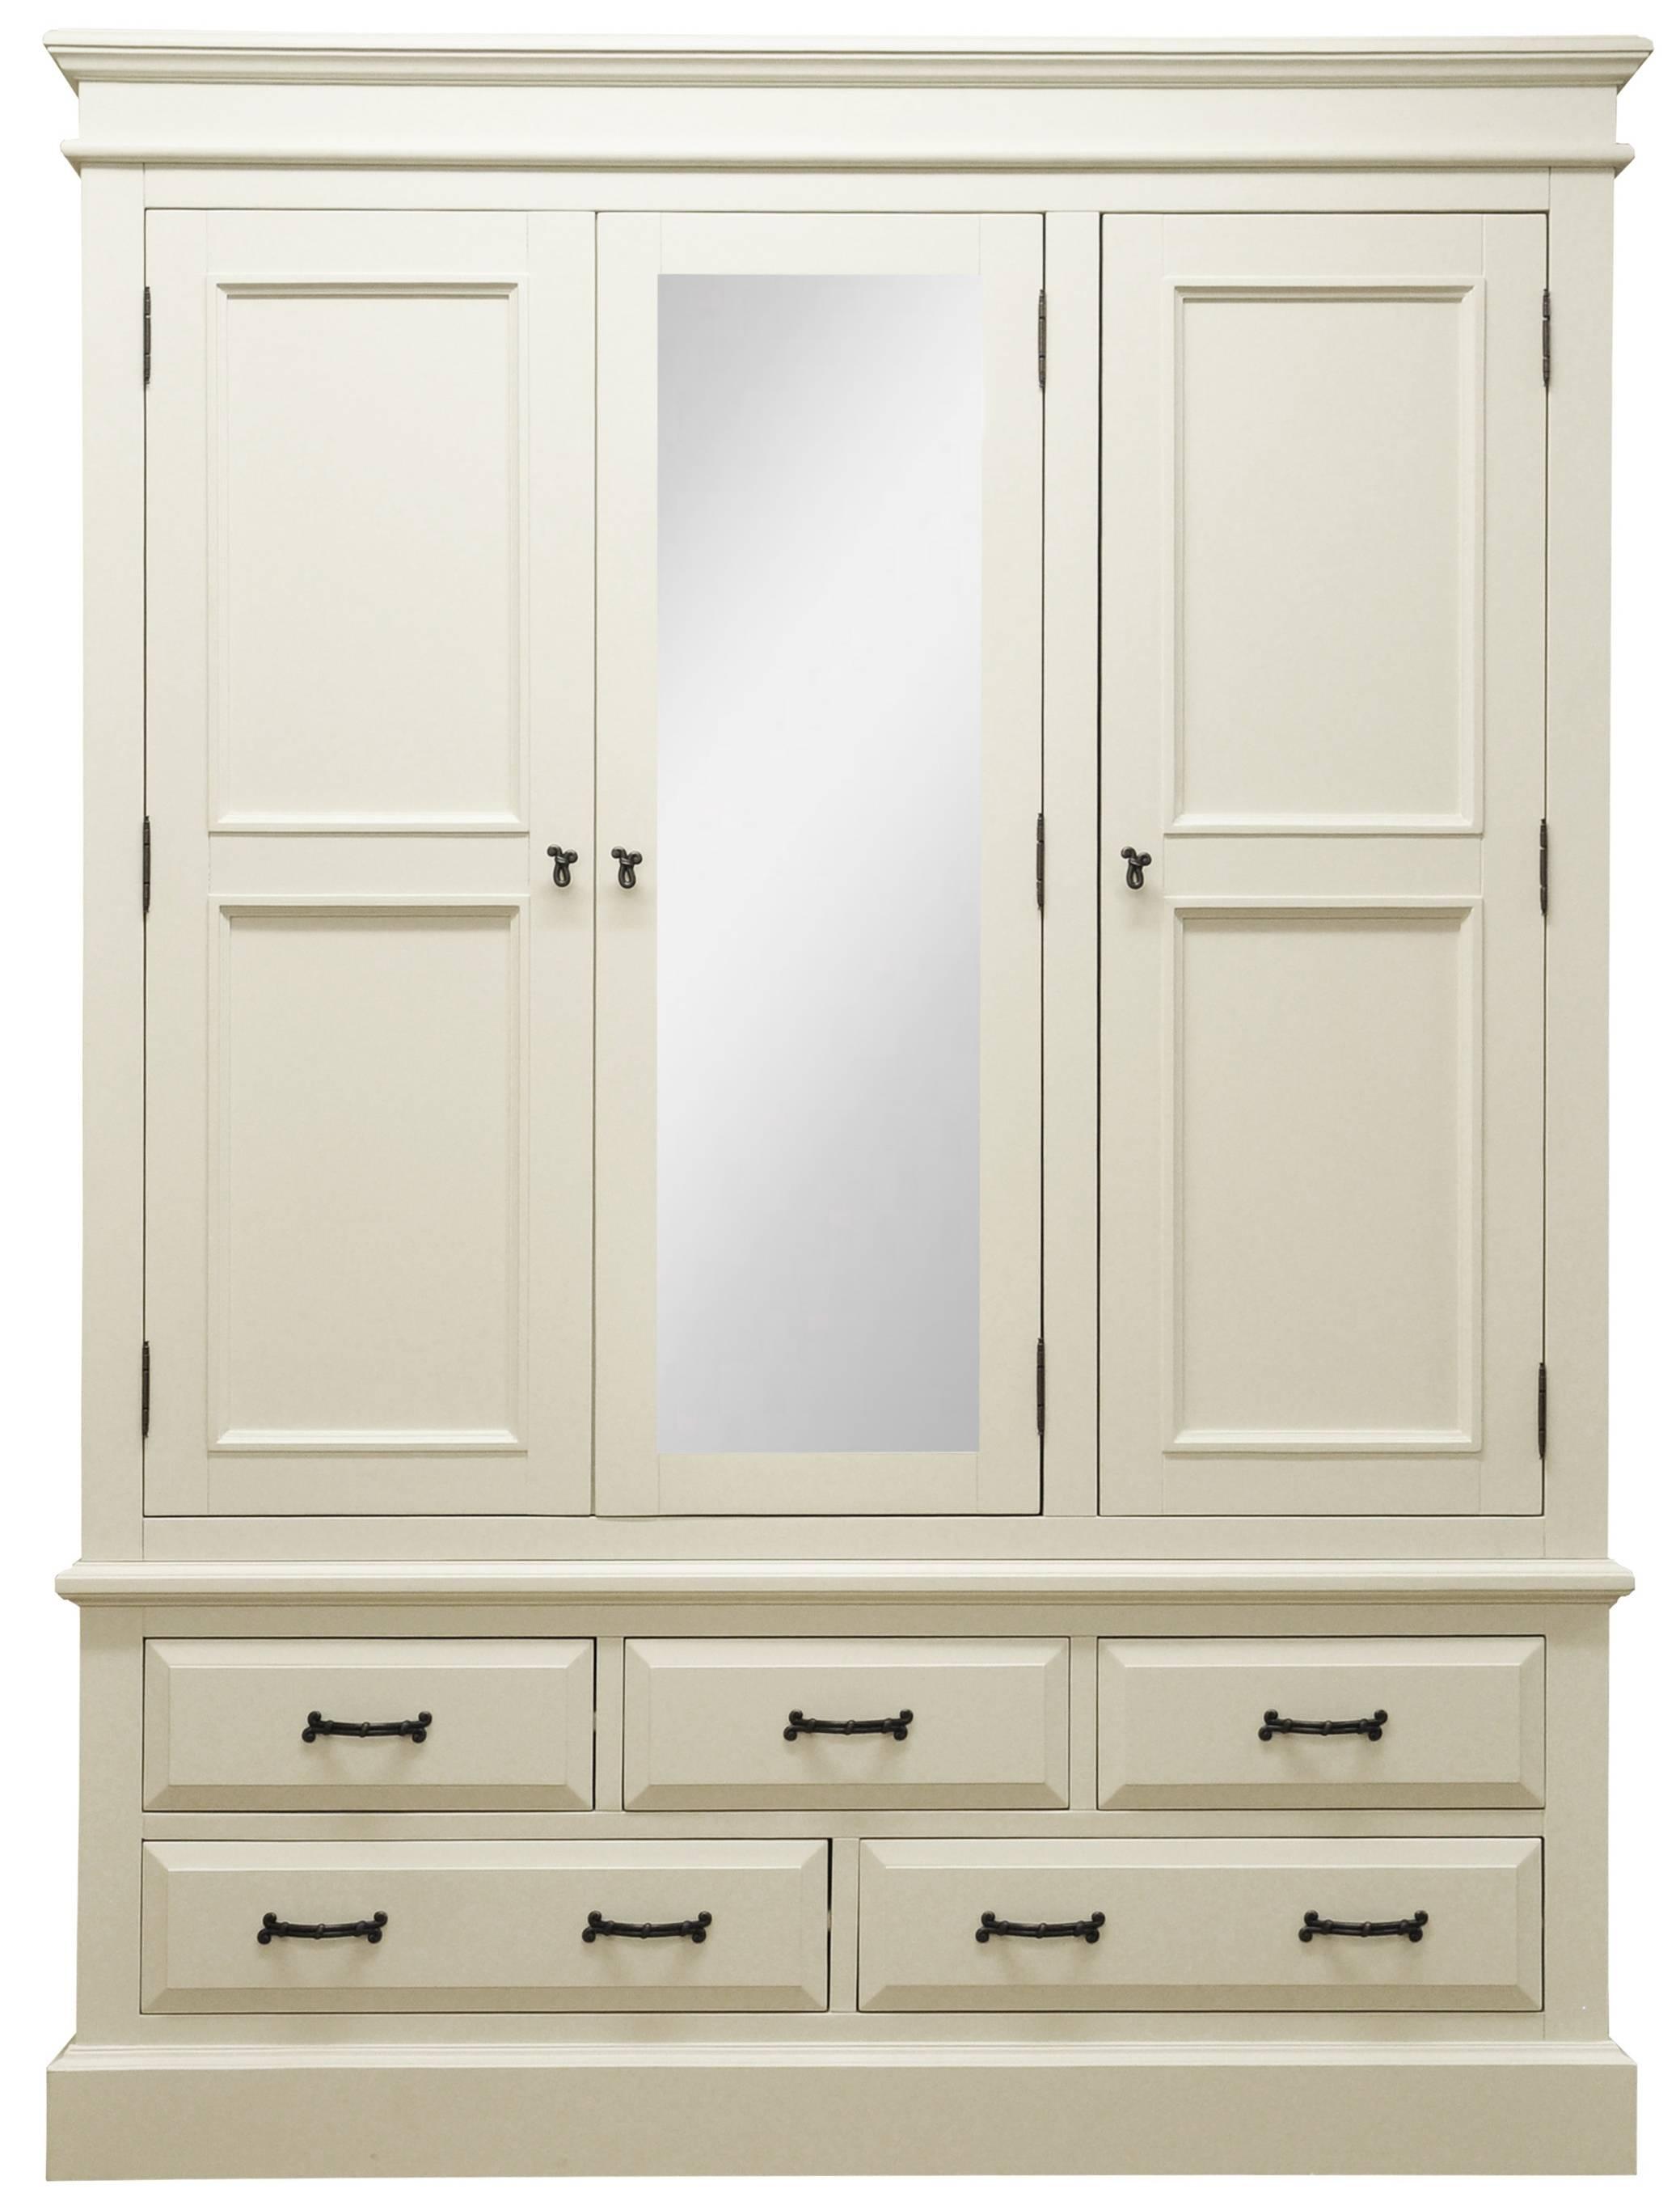 Wardrobes : Henleaze 5 Drawer Painted Wardrobe With Mirrorhenleaze for Three Door Mirrored Wardrobes (Image 14 of 15)